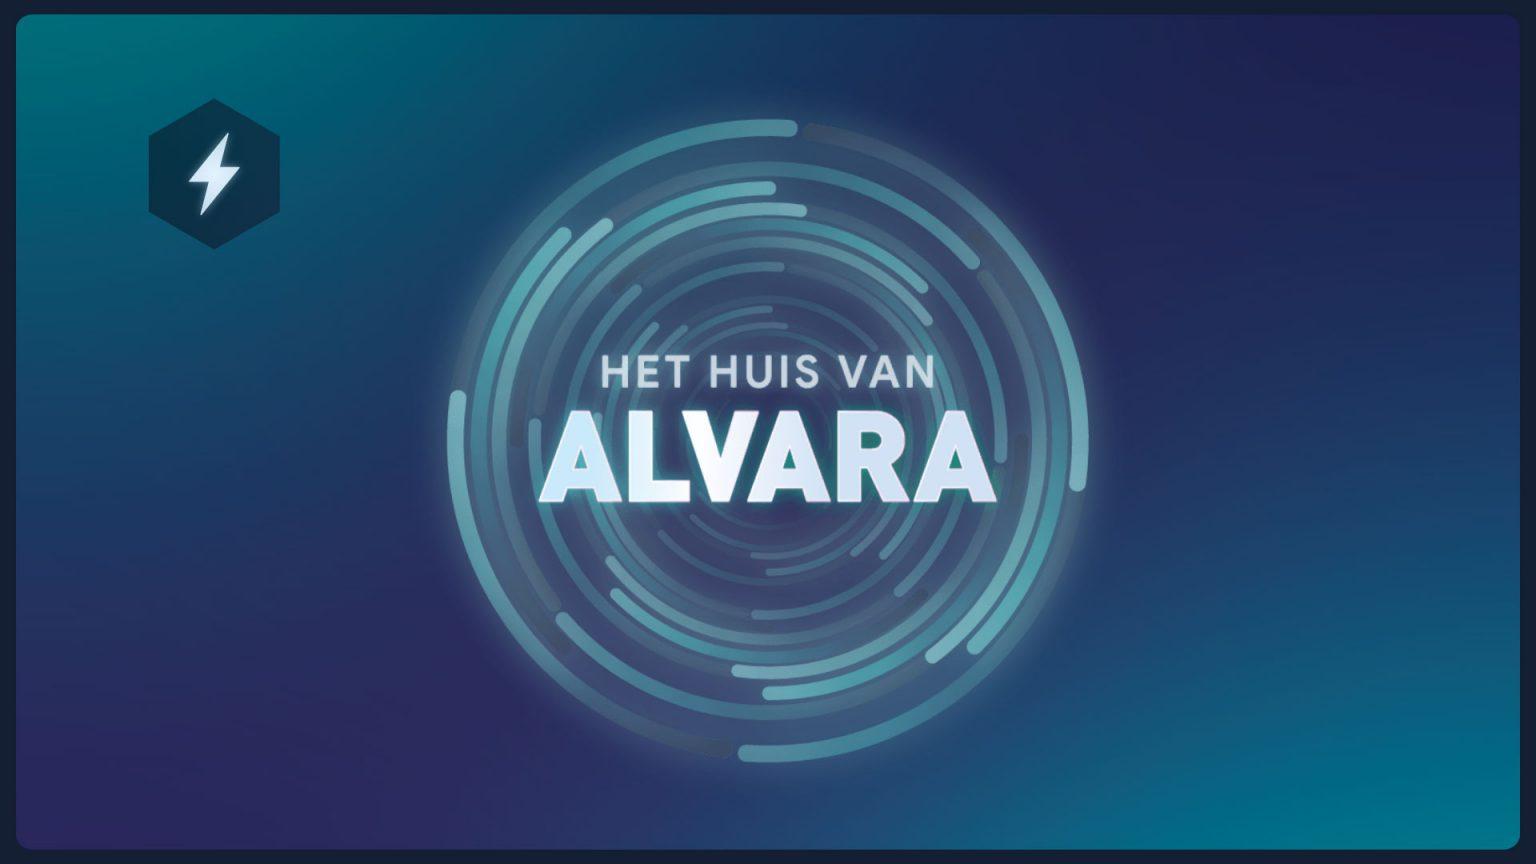 alvara1